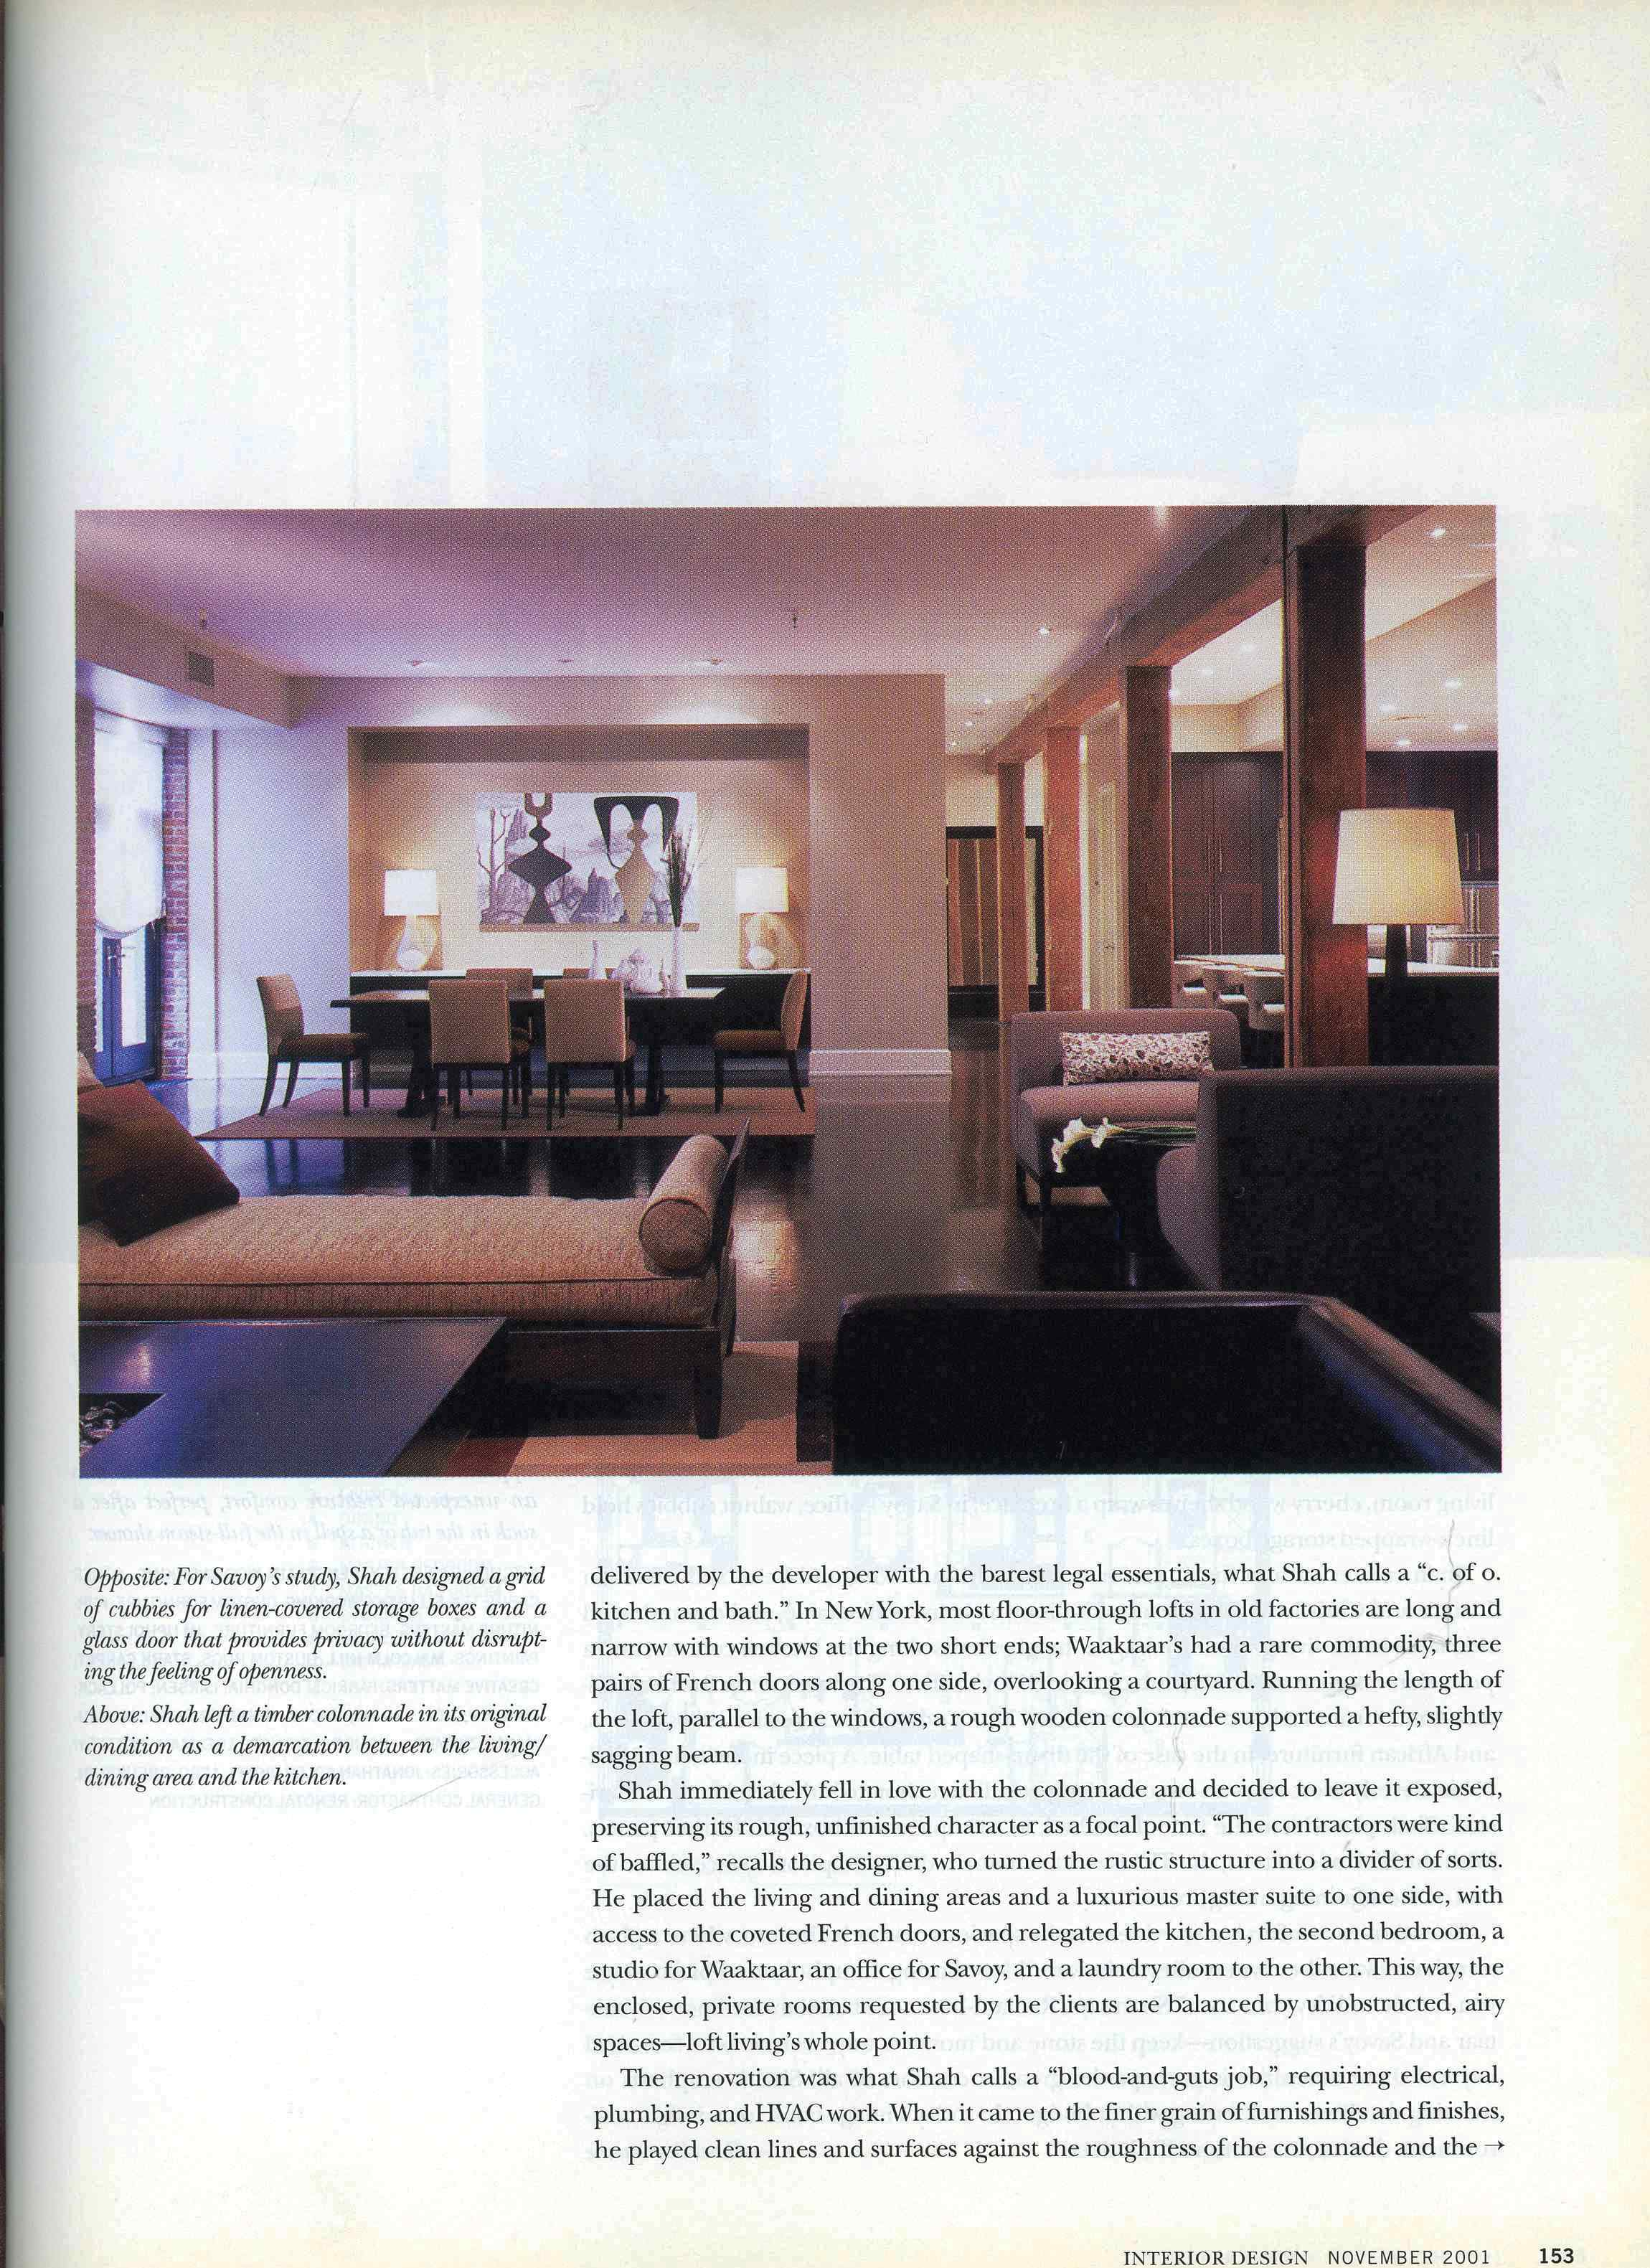 Interior Design_Nov 01_Savoy_Full Article_Page_7.jpg